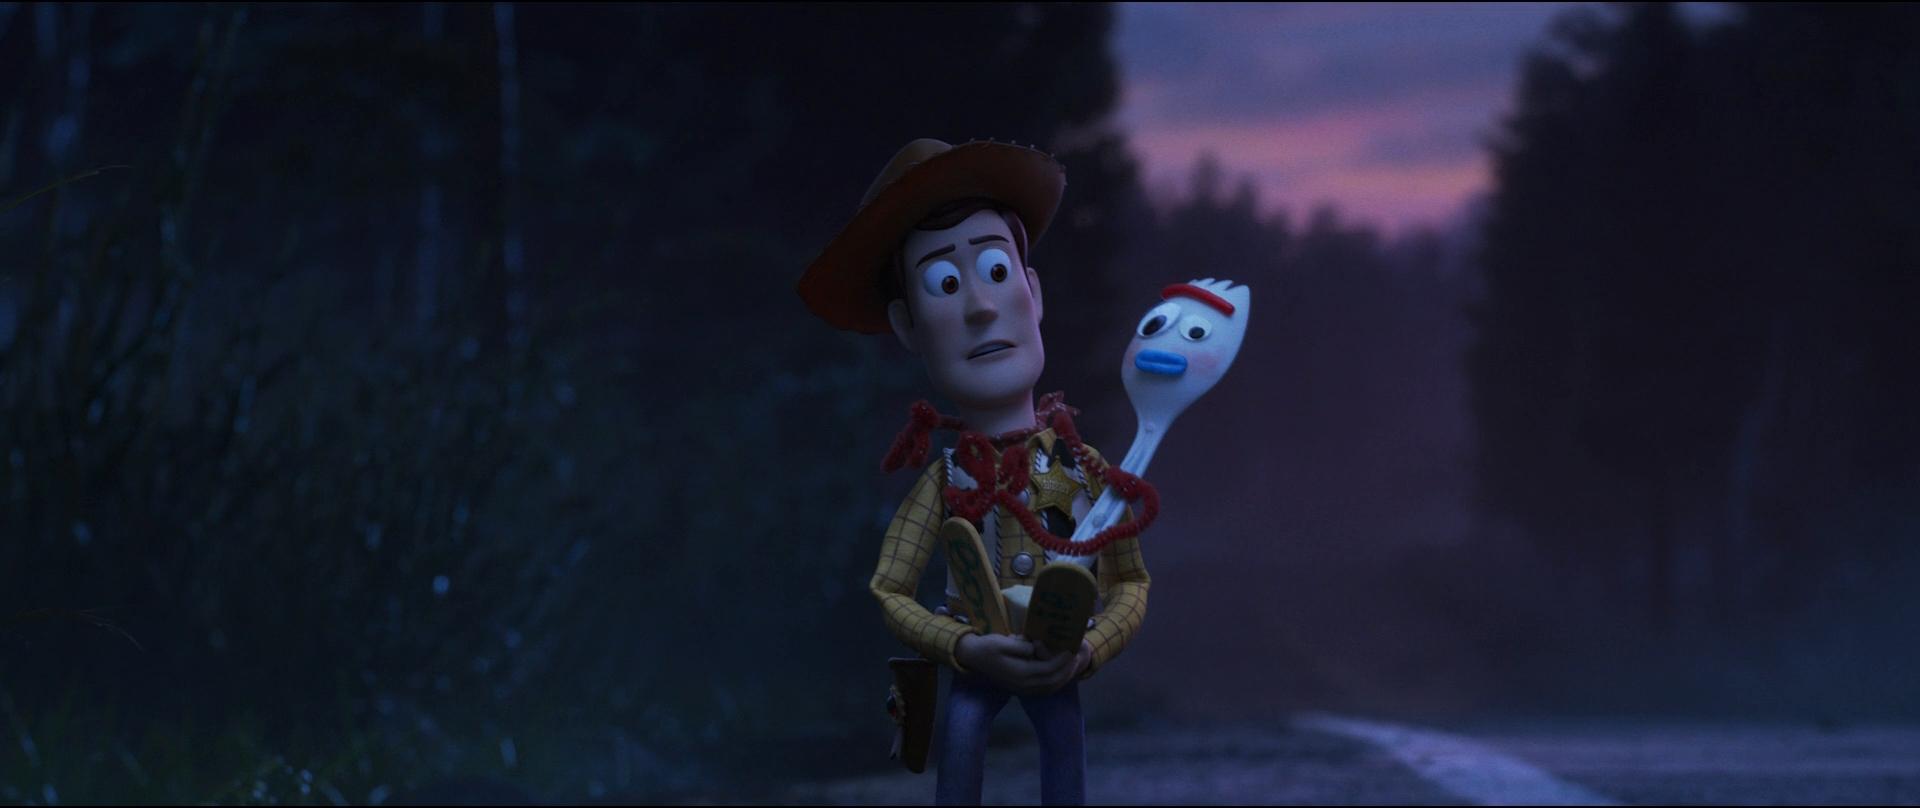 Toy Story Movies Collection 1995-2019 1080p BluRay x264 - LameyHost المجموعة الكاملة مدبلجة للغة العربية تحميل تورنت 10 arabp2p.com